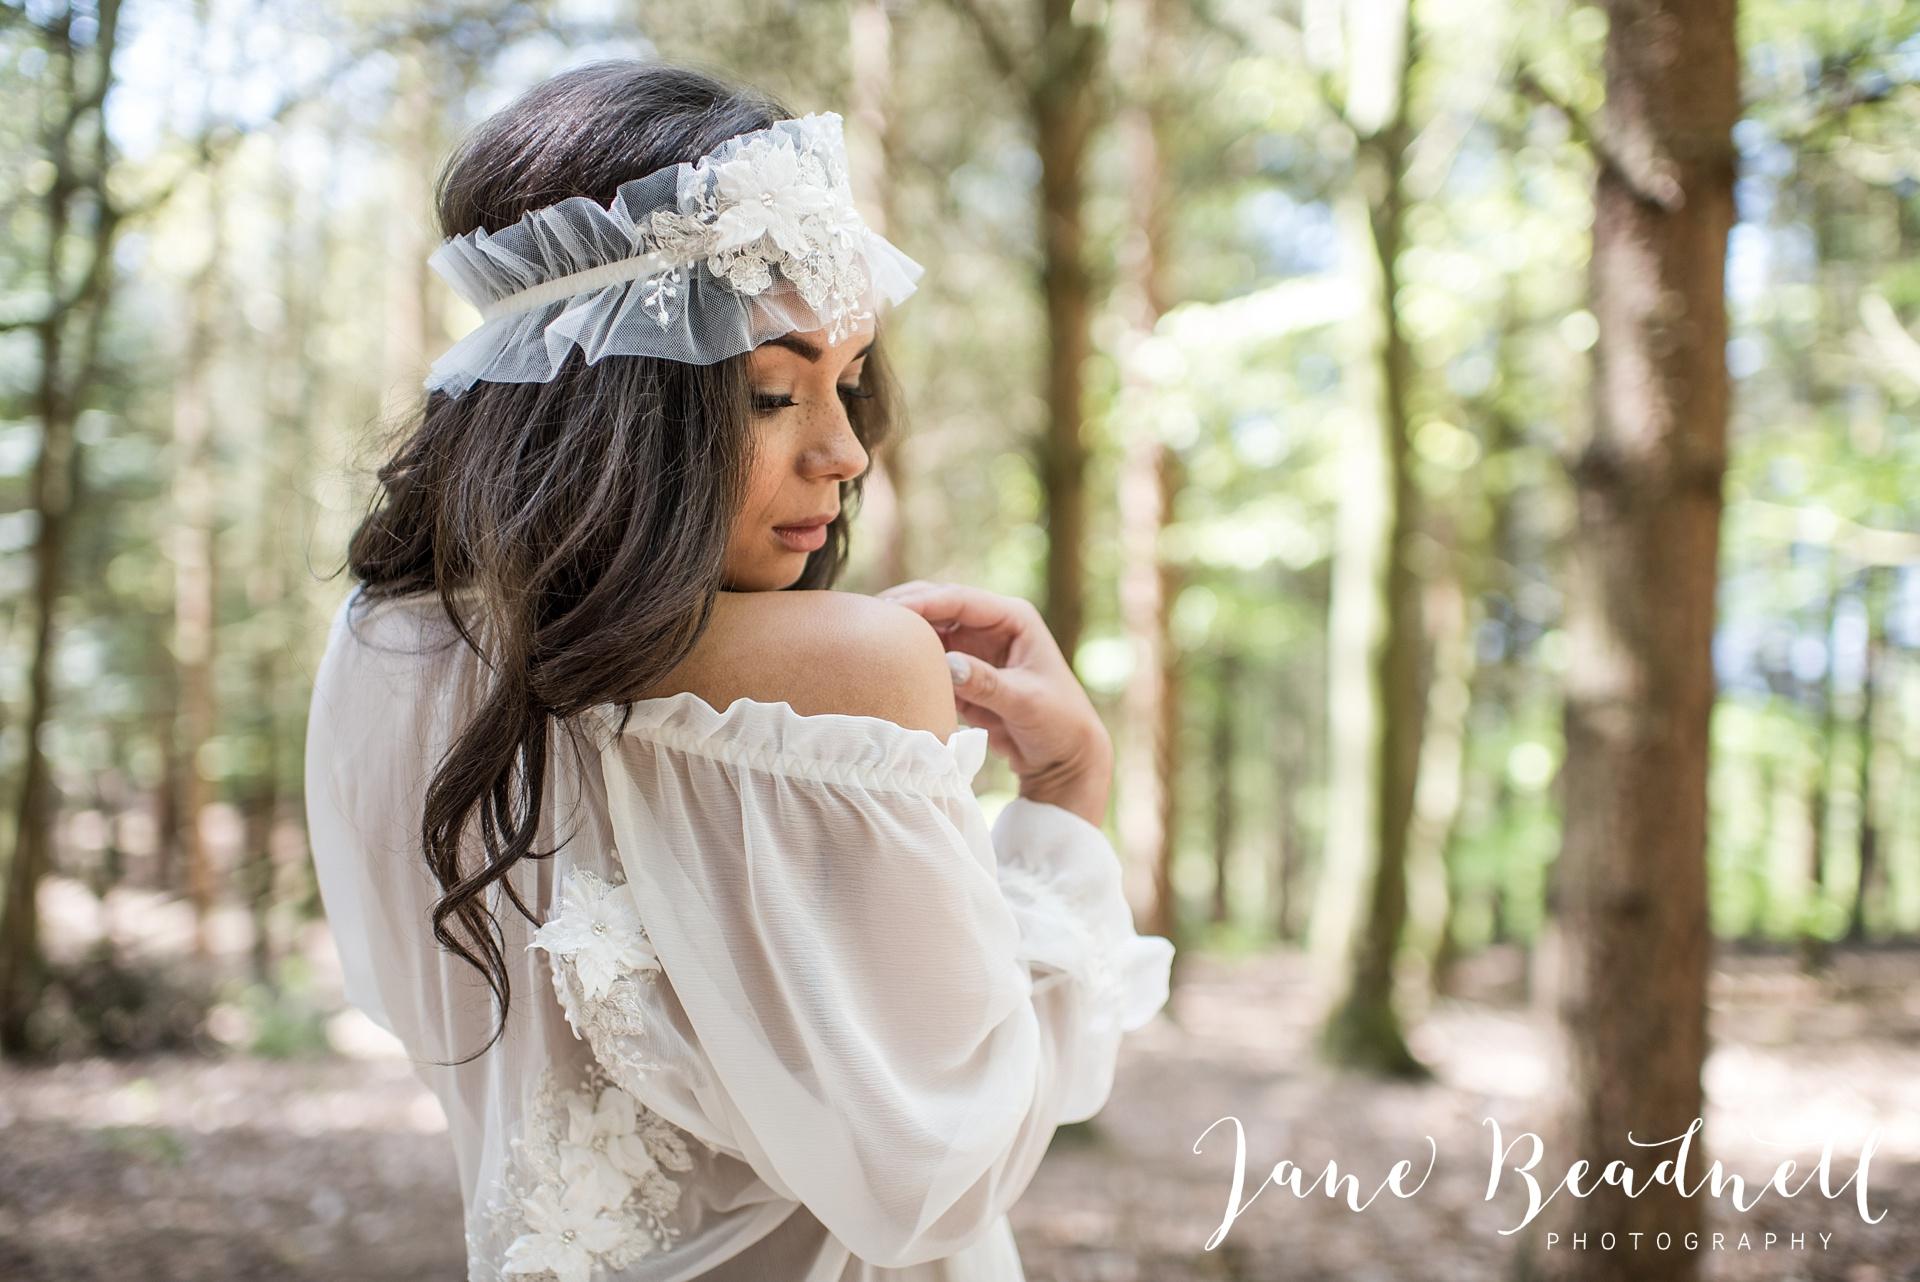 Fine Art Boudoir Photography by wedding photographer Jane Beadnell Photography Otley_0021